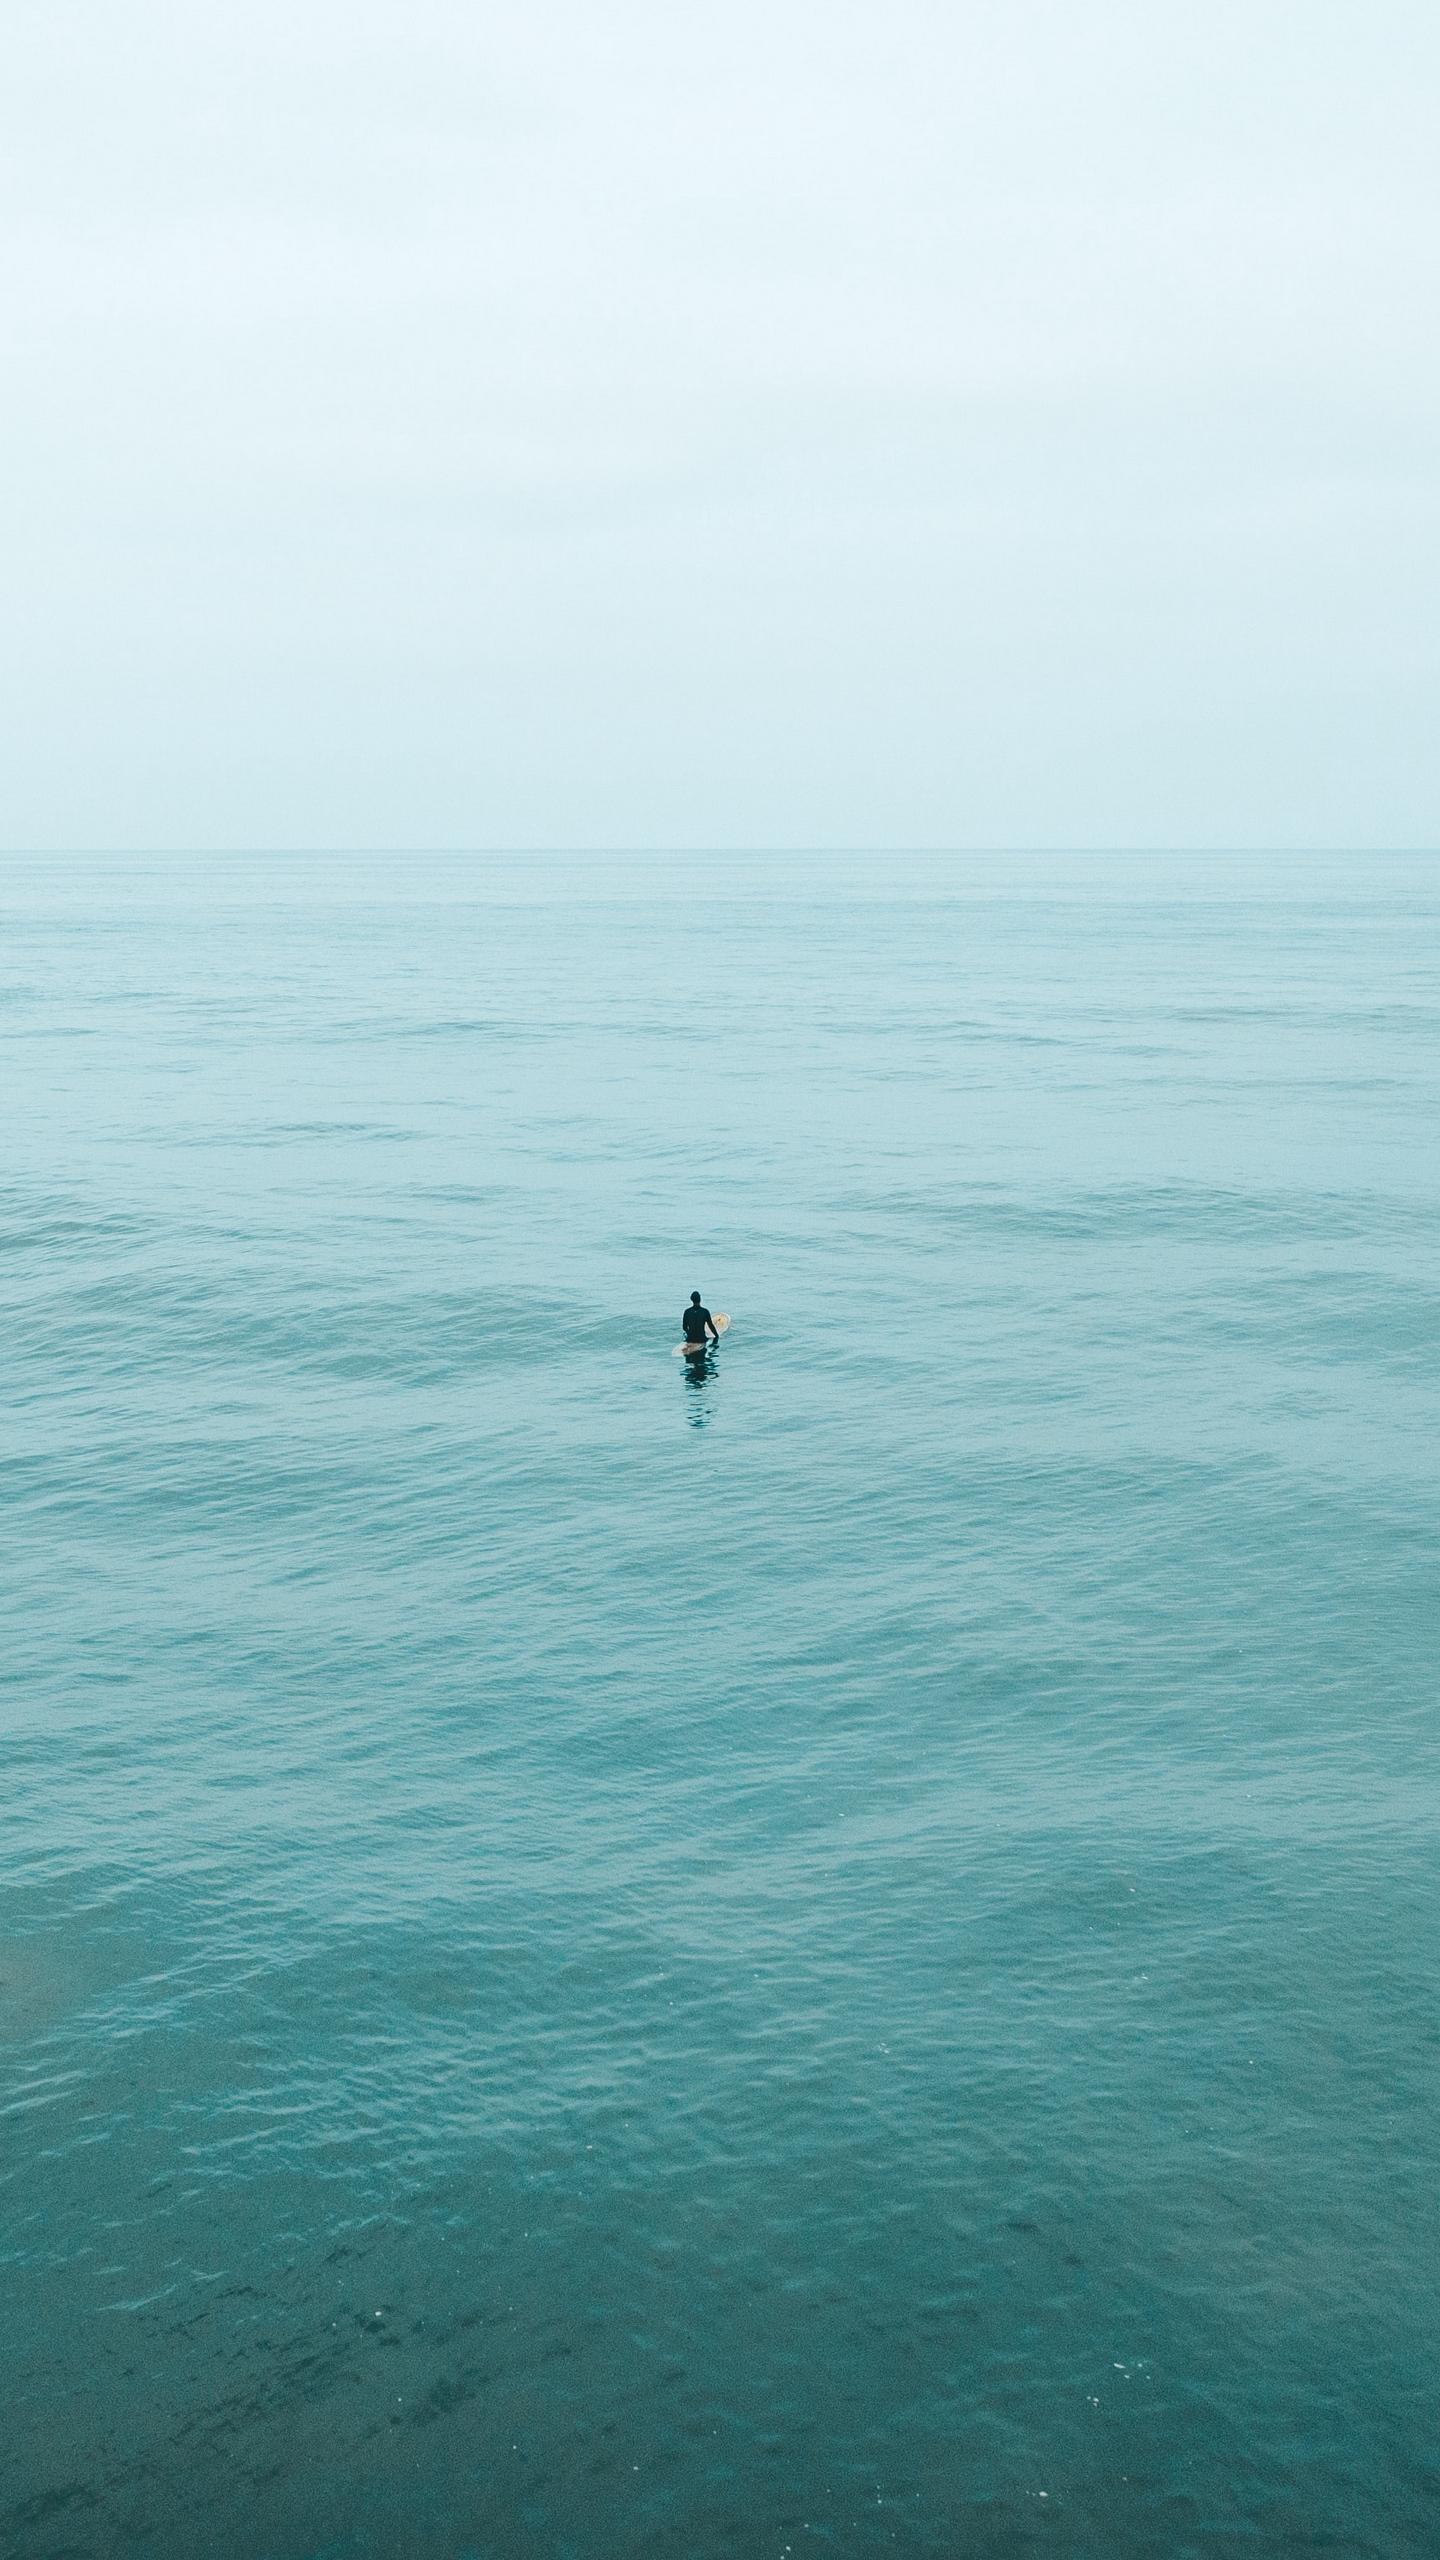 Wallpaper Surfer, Surfing, Ocean, Water, Waves - Sea , HD Wallpaper & Backgrounds